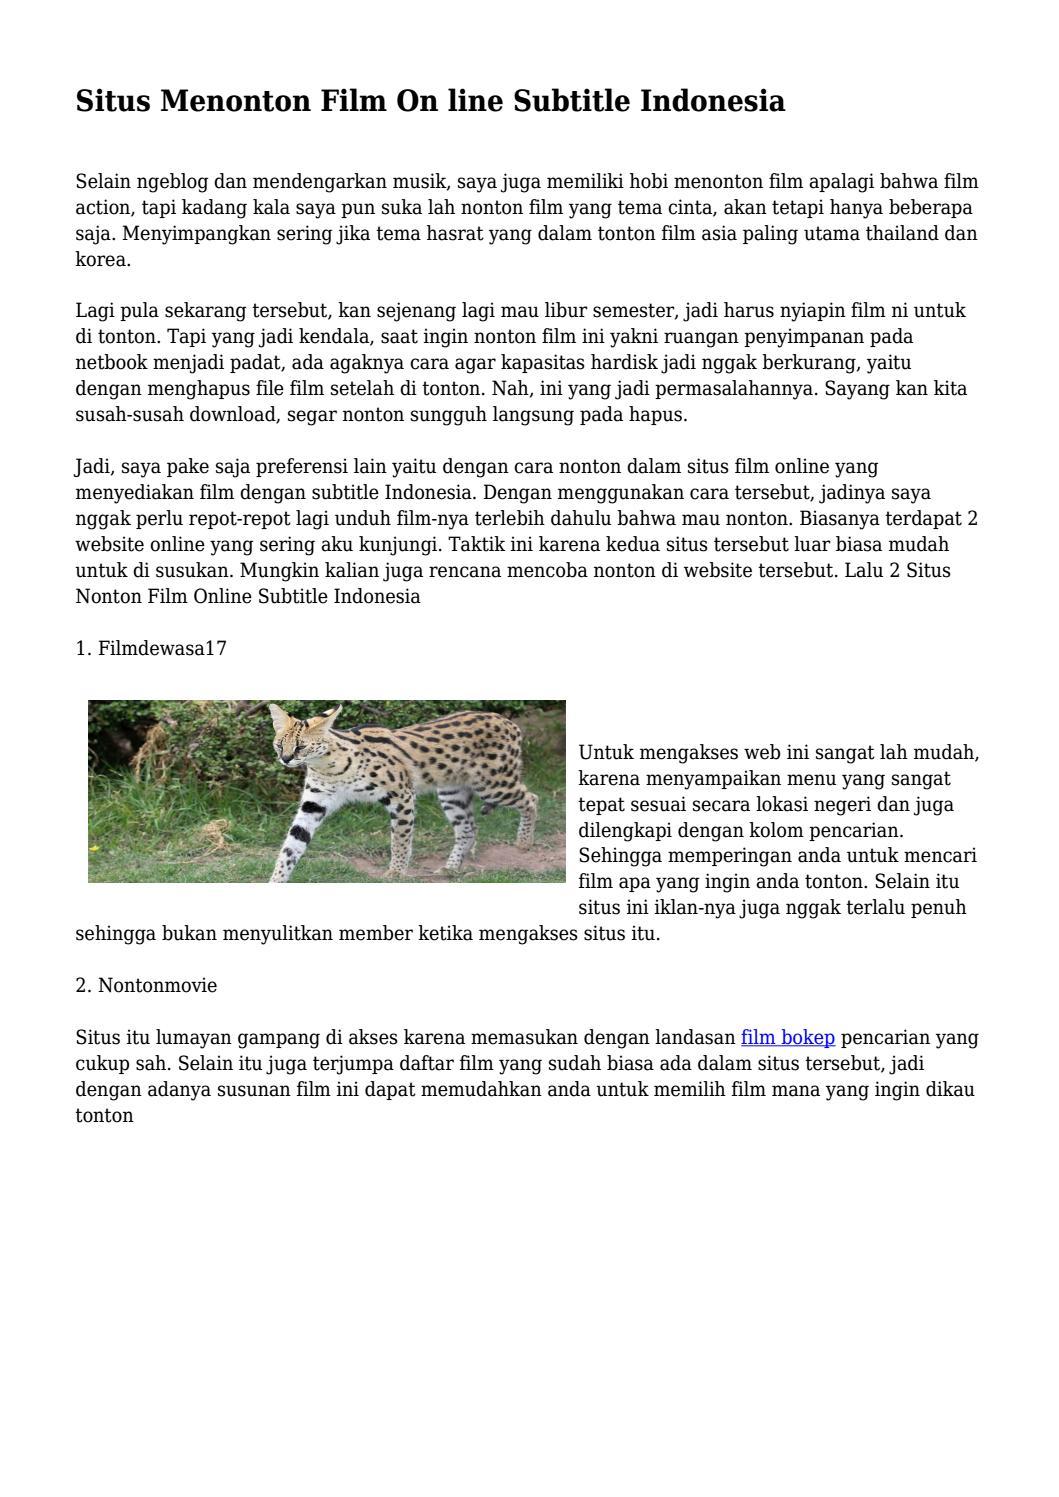 Situs Menonton Film On line Subtitle Indonesia    by tapbelanjaexpo